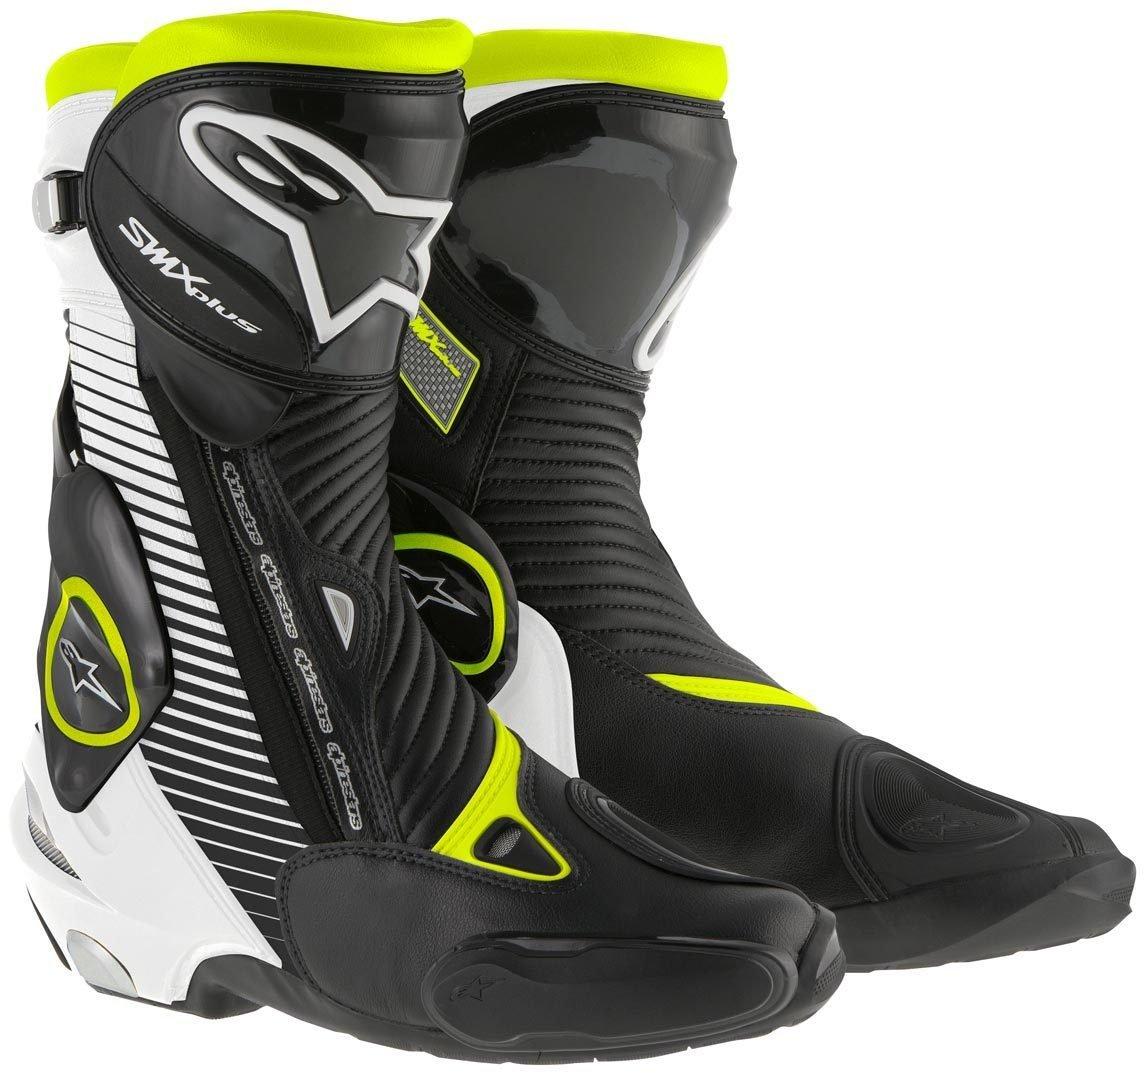 Alpinestars アルパインスター SMX Plus Boots 2015モデル ブーツ ブラック/ホワイト/イエロー 39(約25cm) B00XIR6YGQ